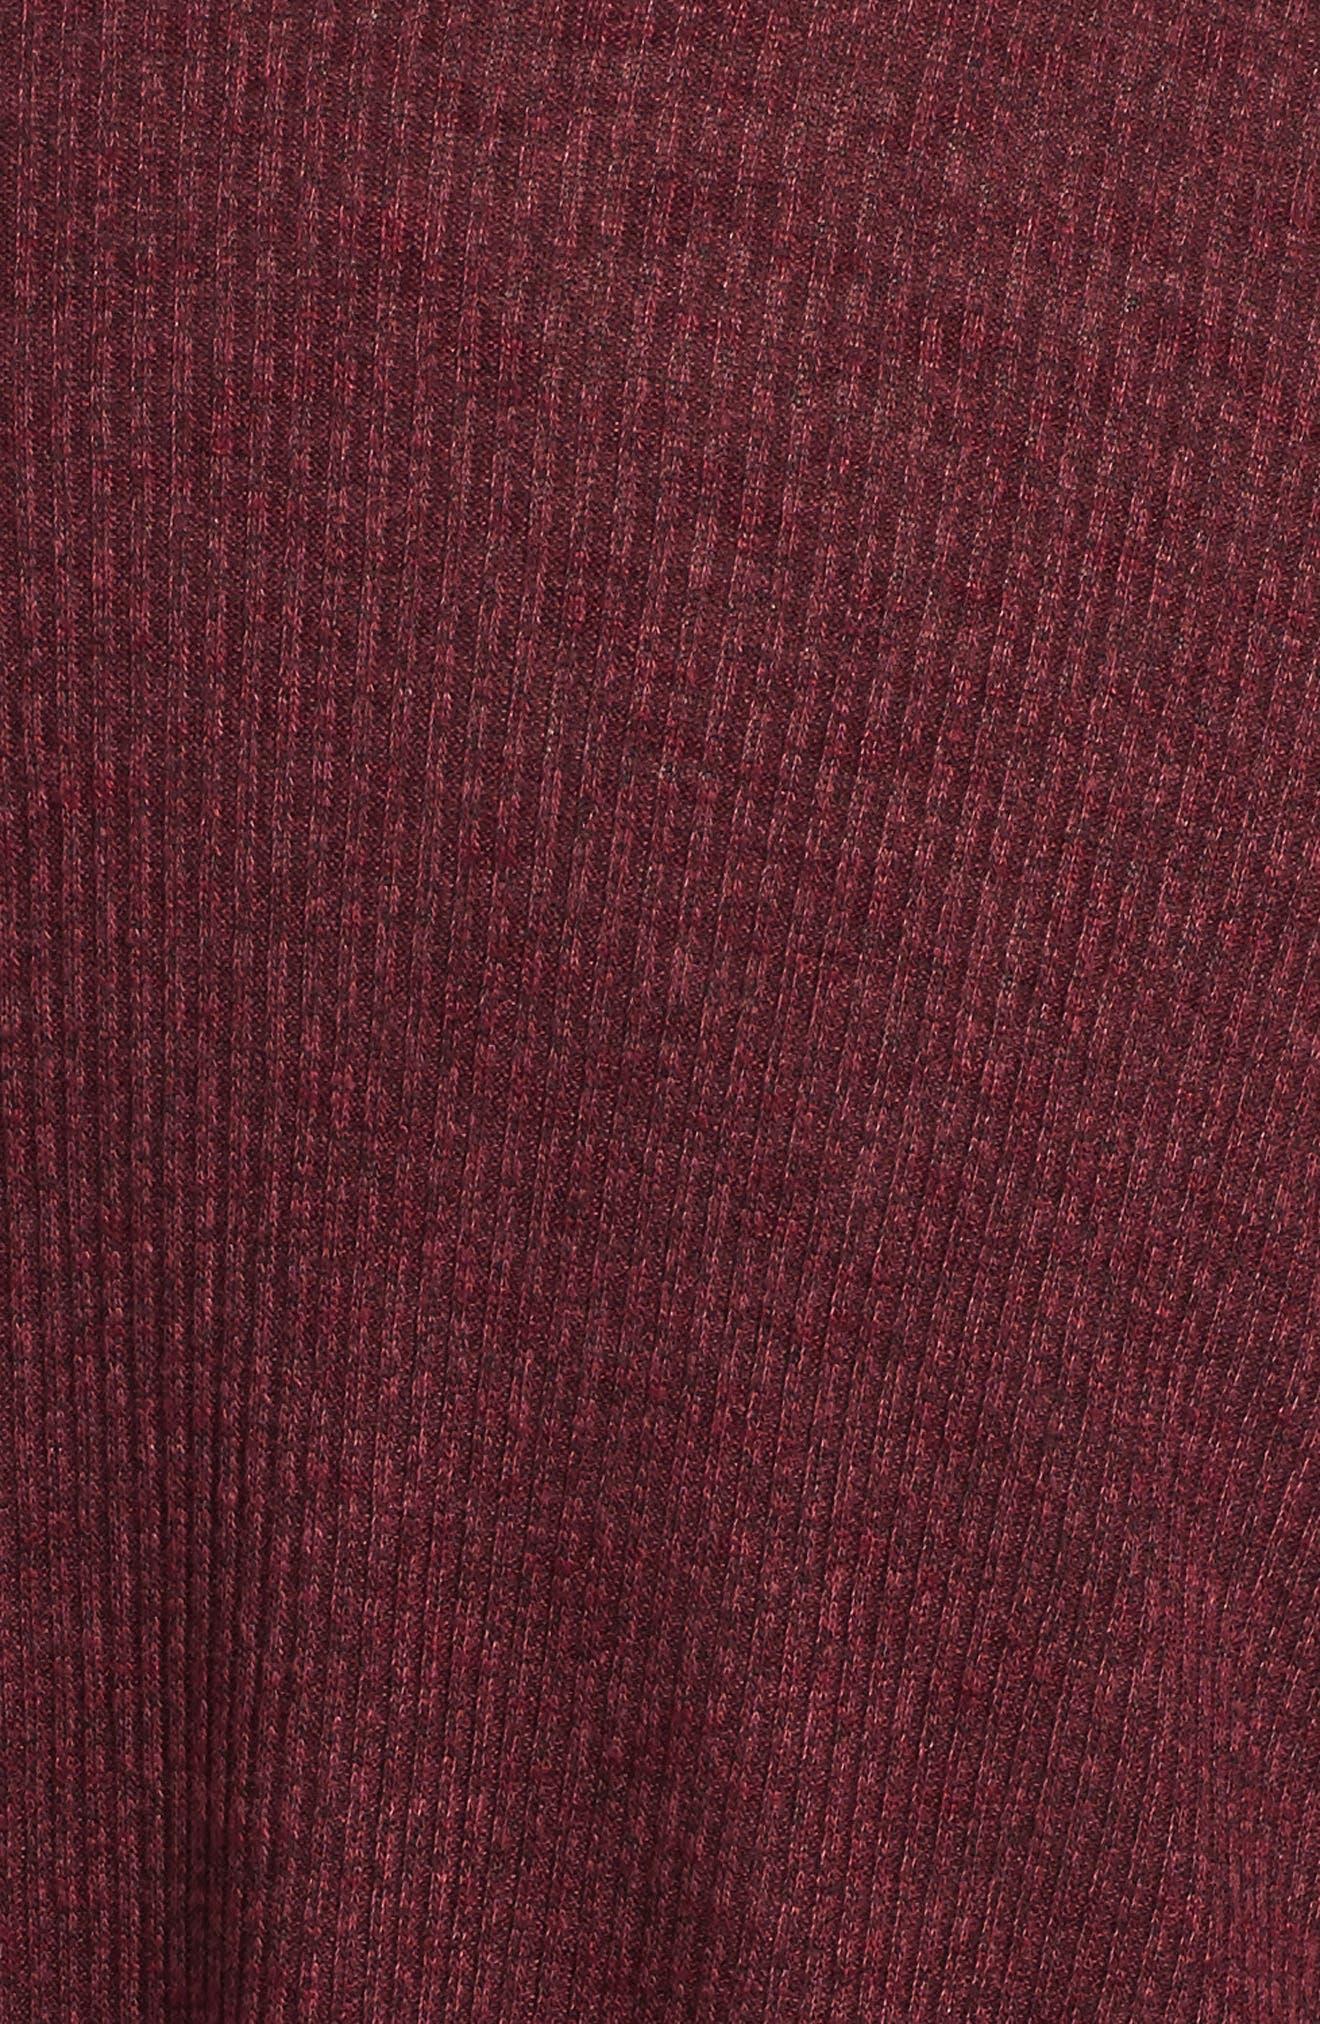 Alternate Image 3  - Soprano Rib Knit Sweater Dress (Big Girls)